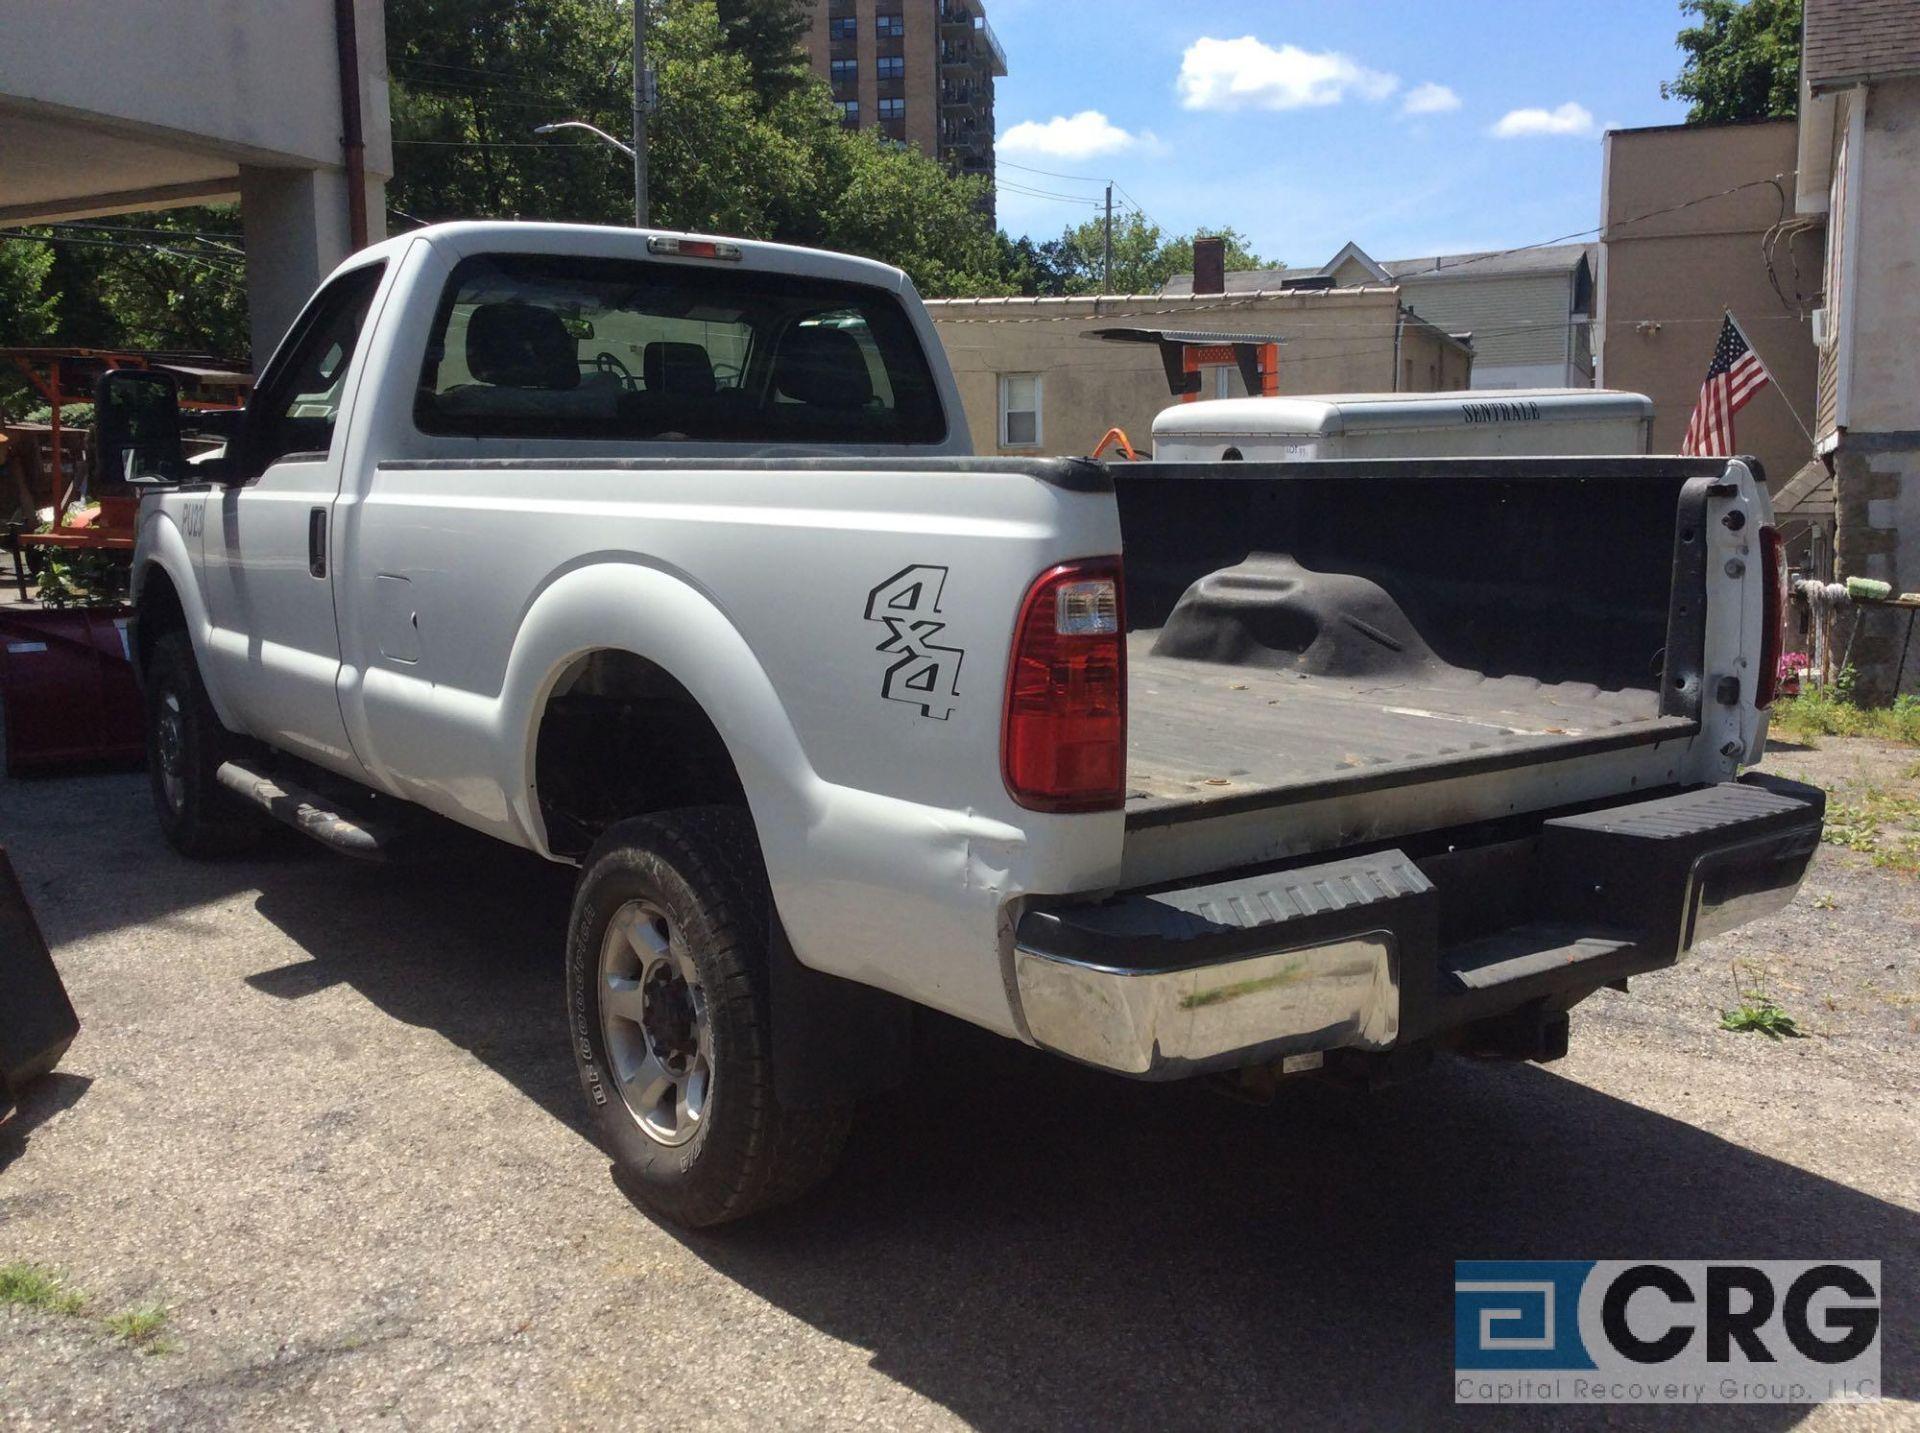 Lot 335 - 2016 Ford F350 Super Duty Pick Up Truck VIN#, 19928 miles, 4X4, 6.2 litre V-8 gas engine, AT,